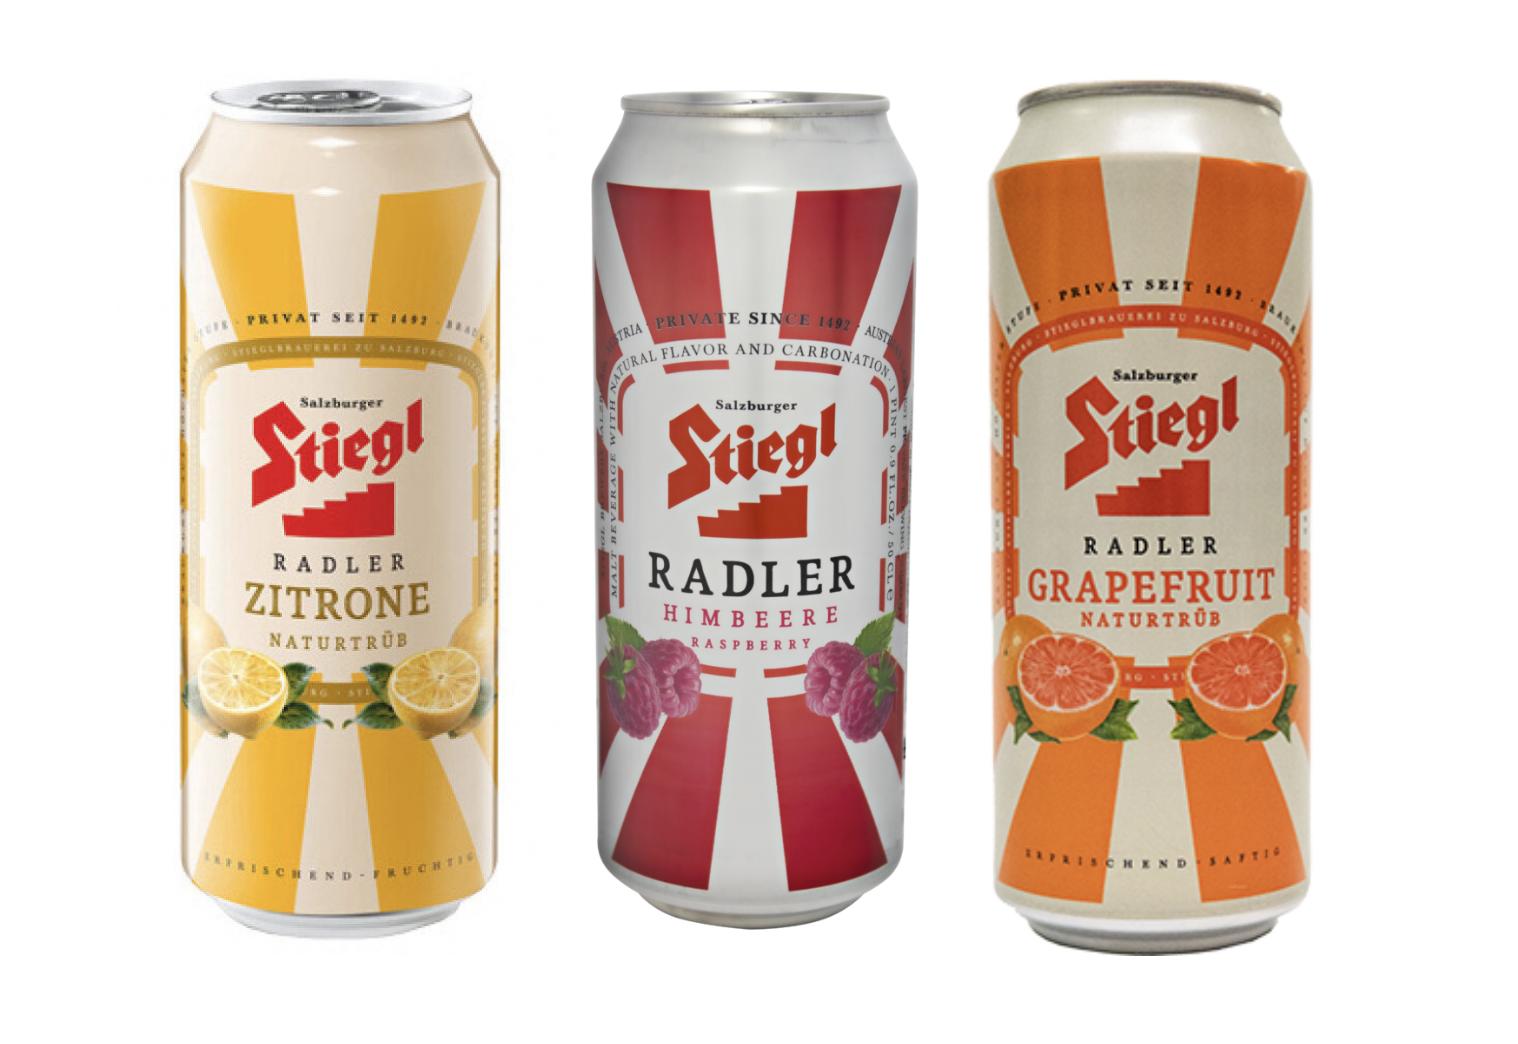 Stiegl Radlers - Zitrone, Himbeere (Raspberry) and Grapefruit